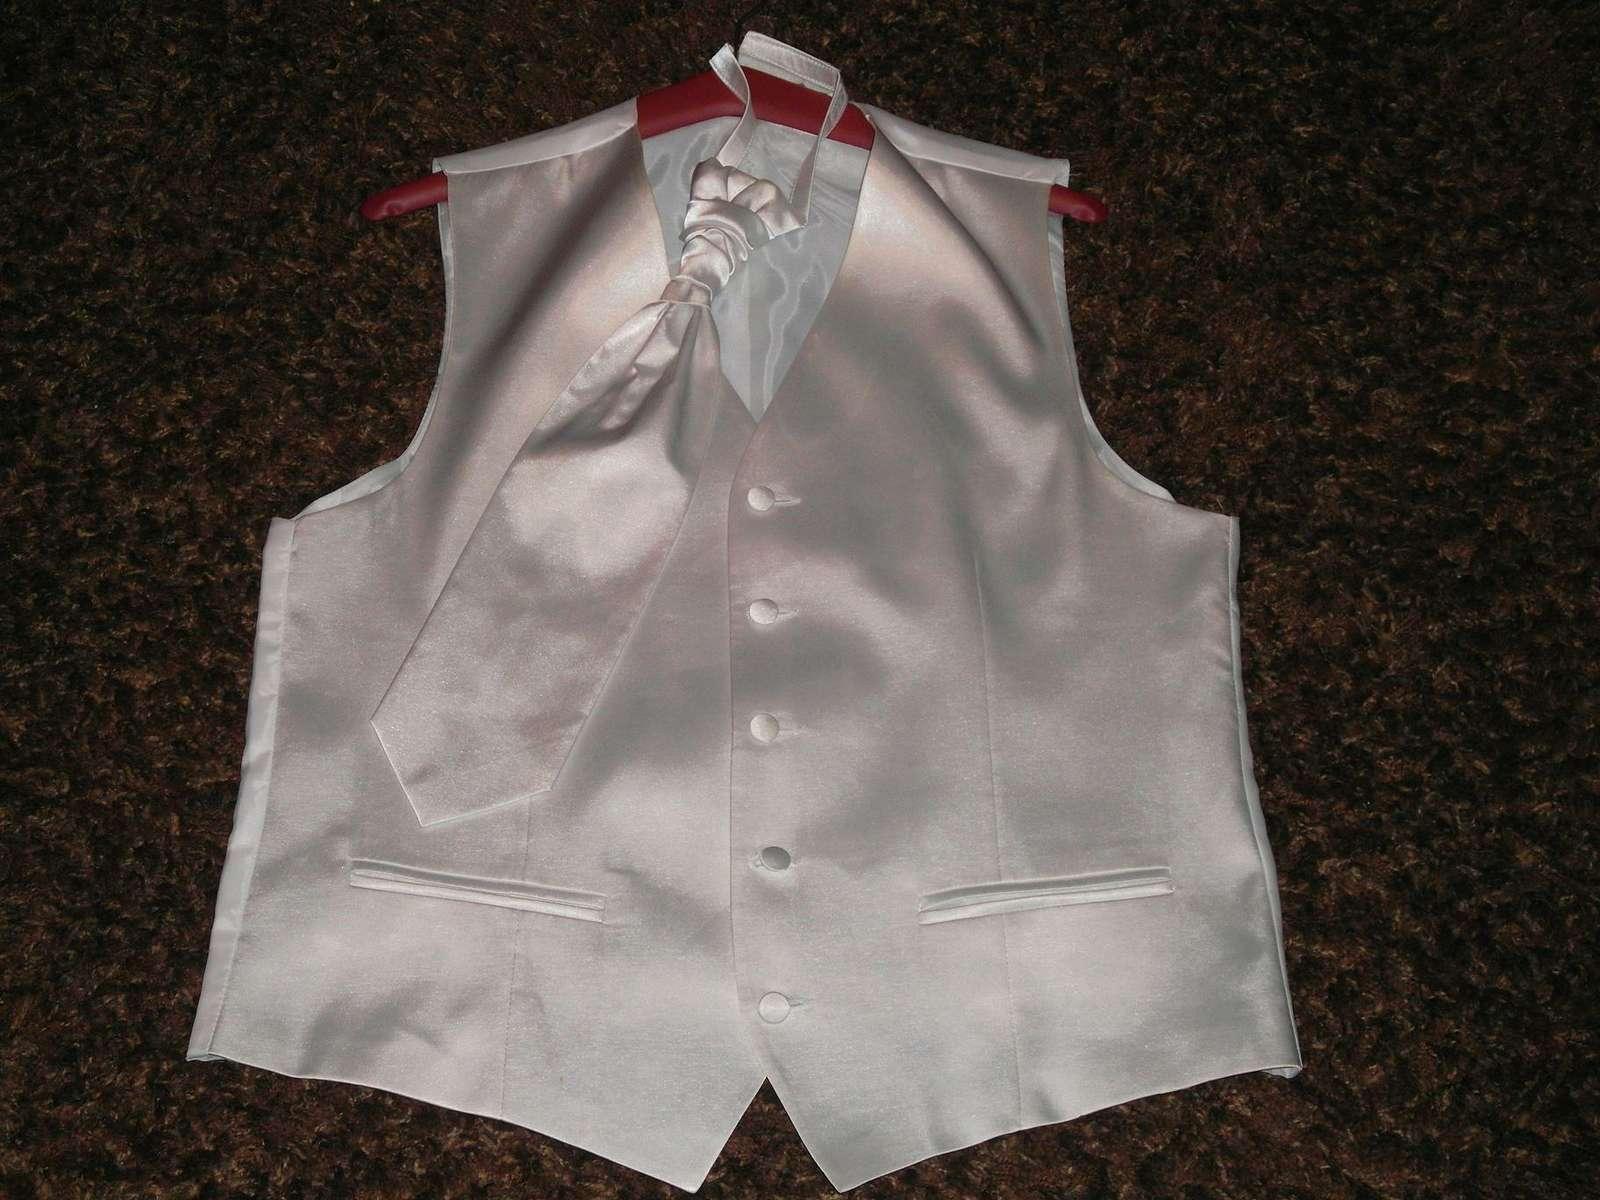 Biela leskla vesta s kravatou - Obrázok č. 3